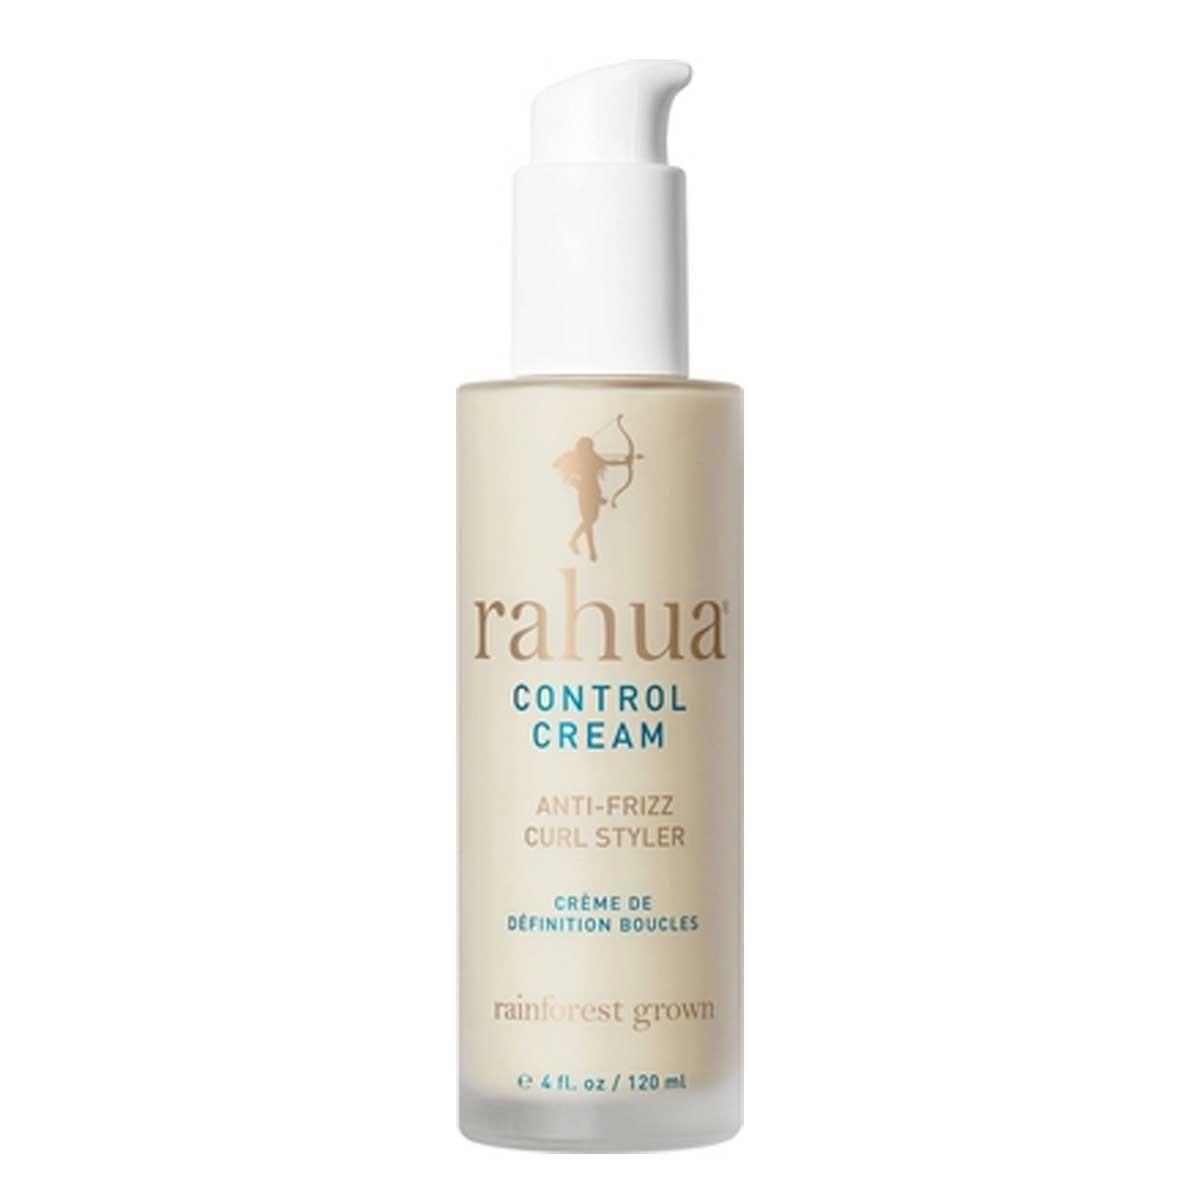 Rahua Control Cream - Crema  para rizos